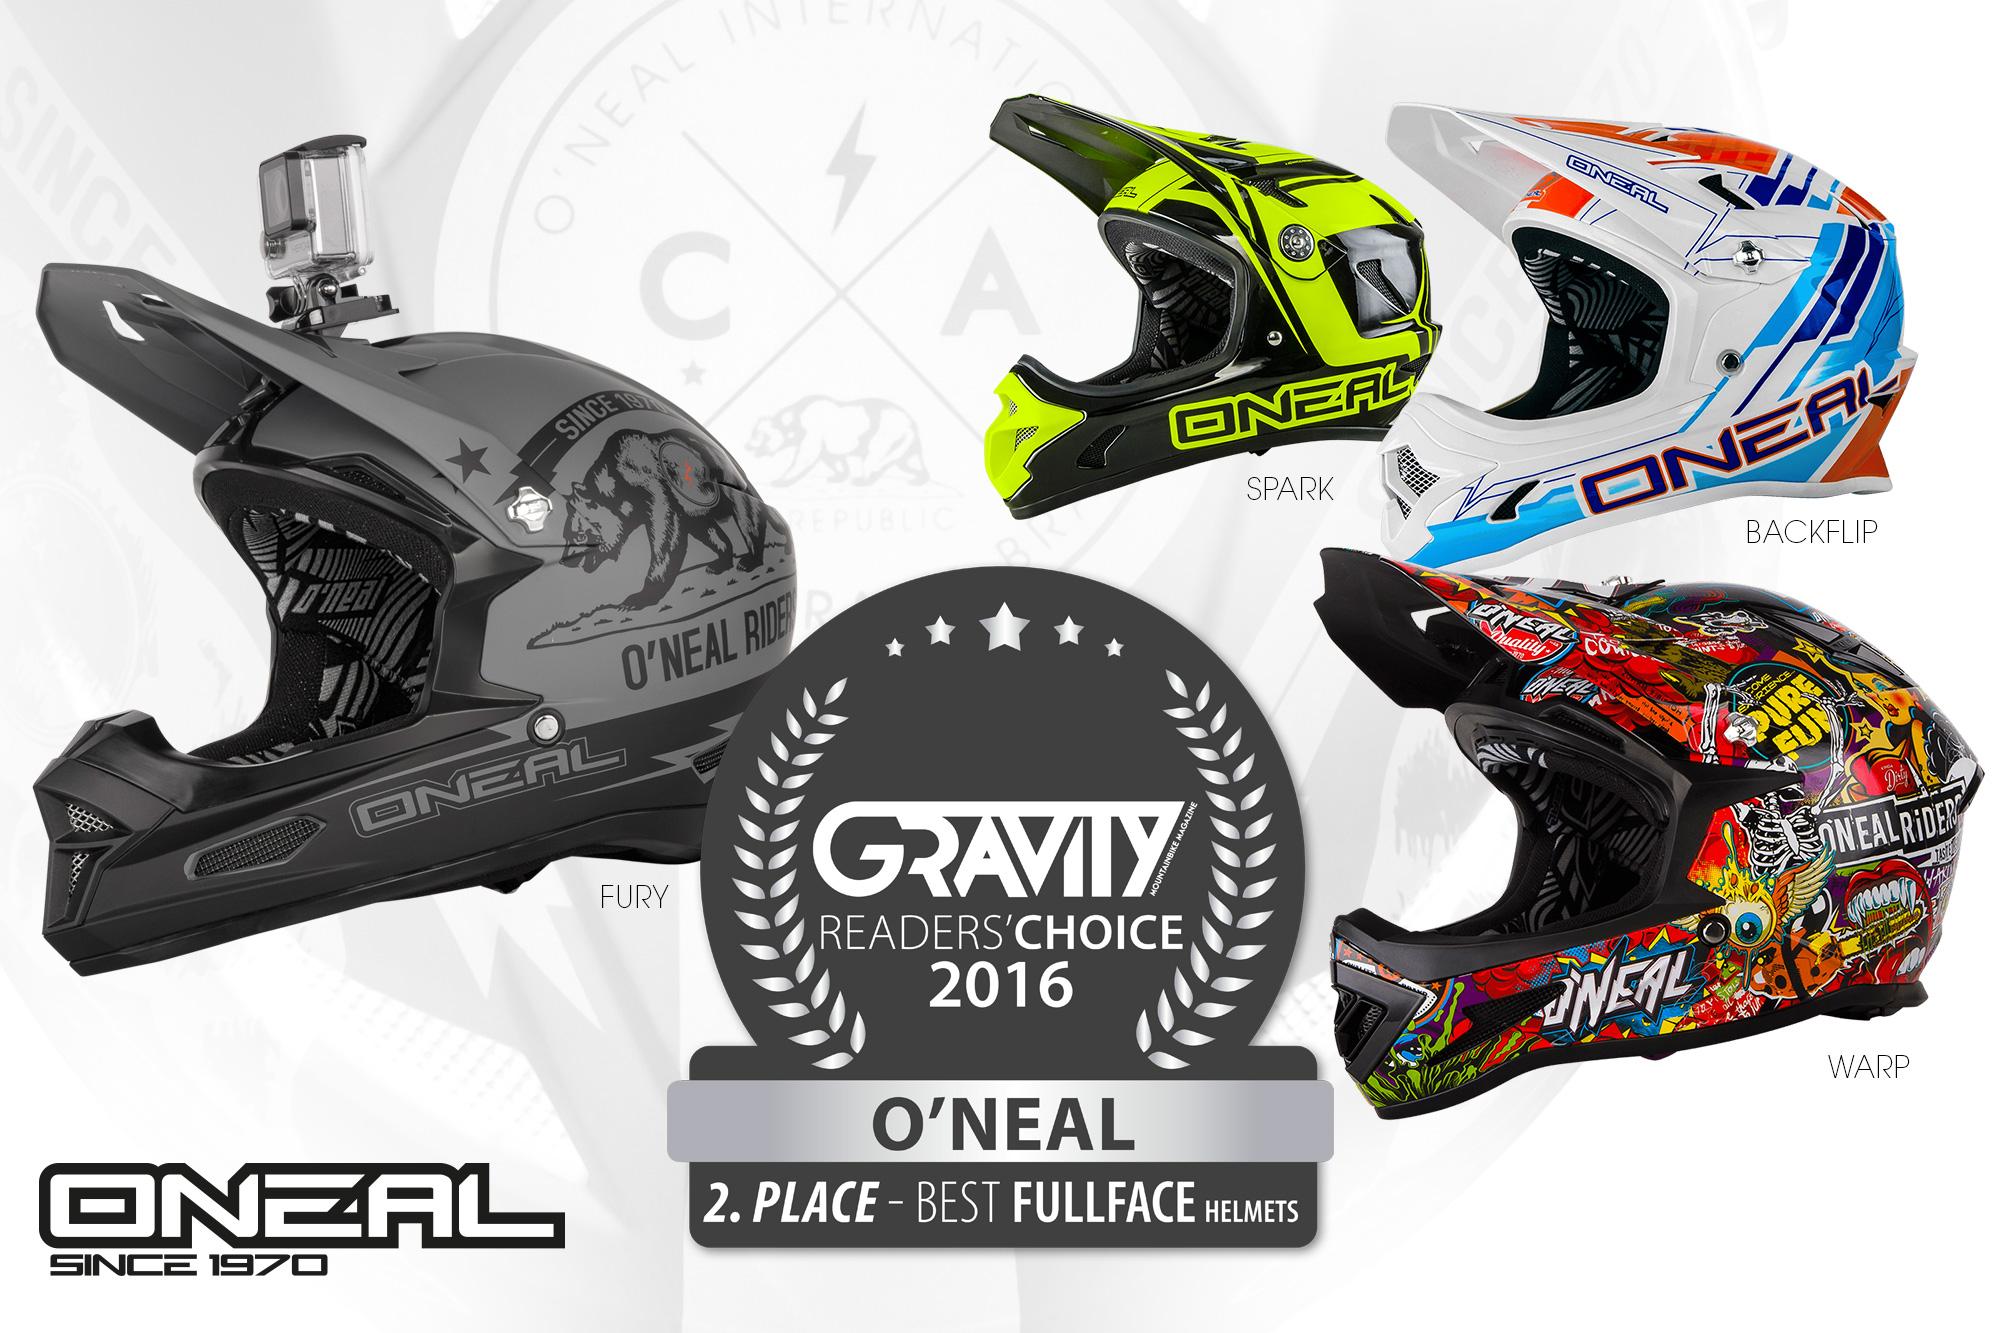 gravity_oneal-helmets_2016